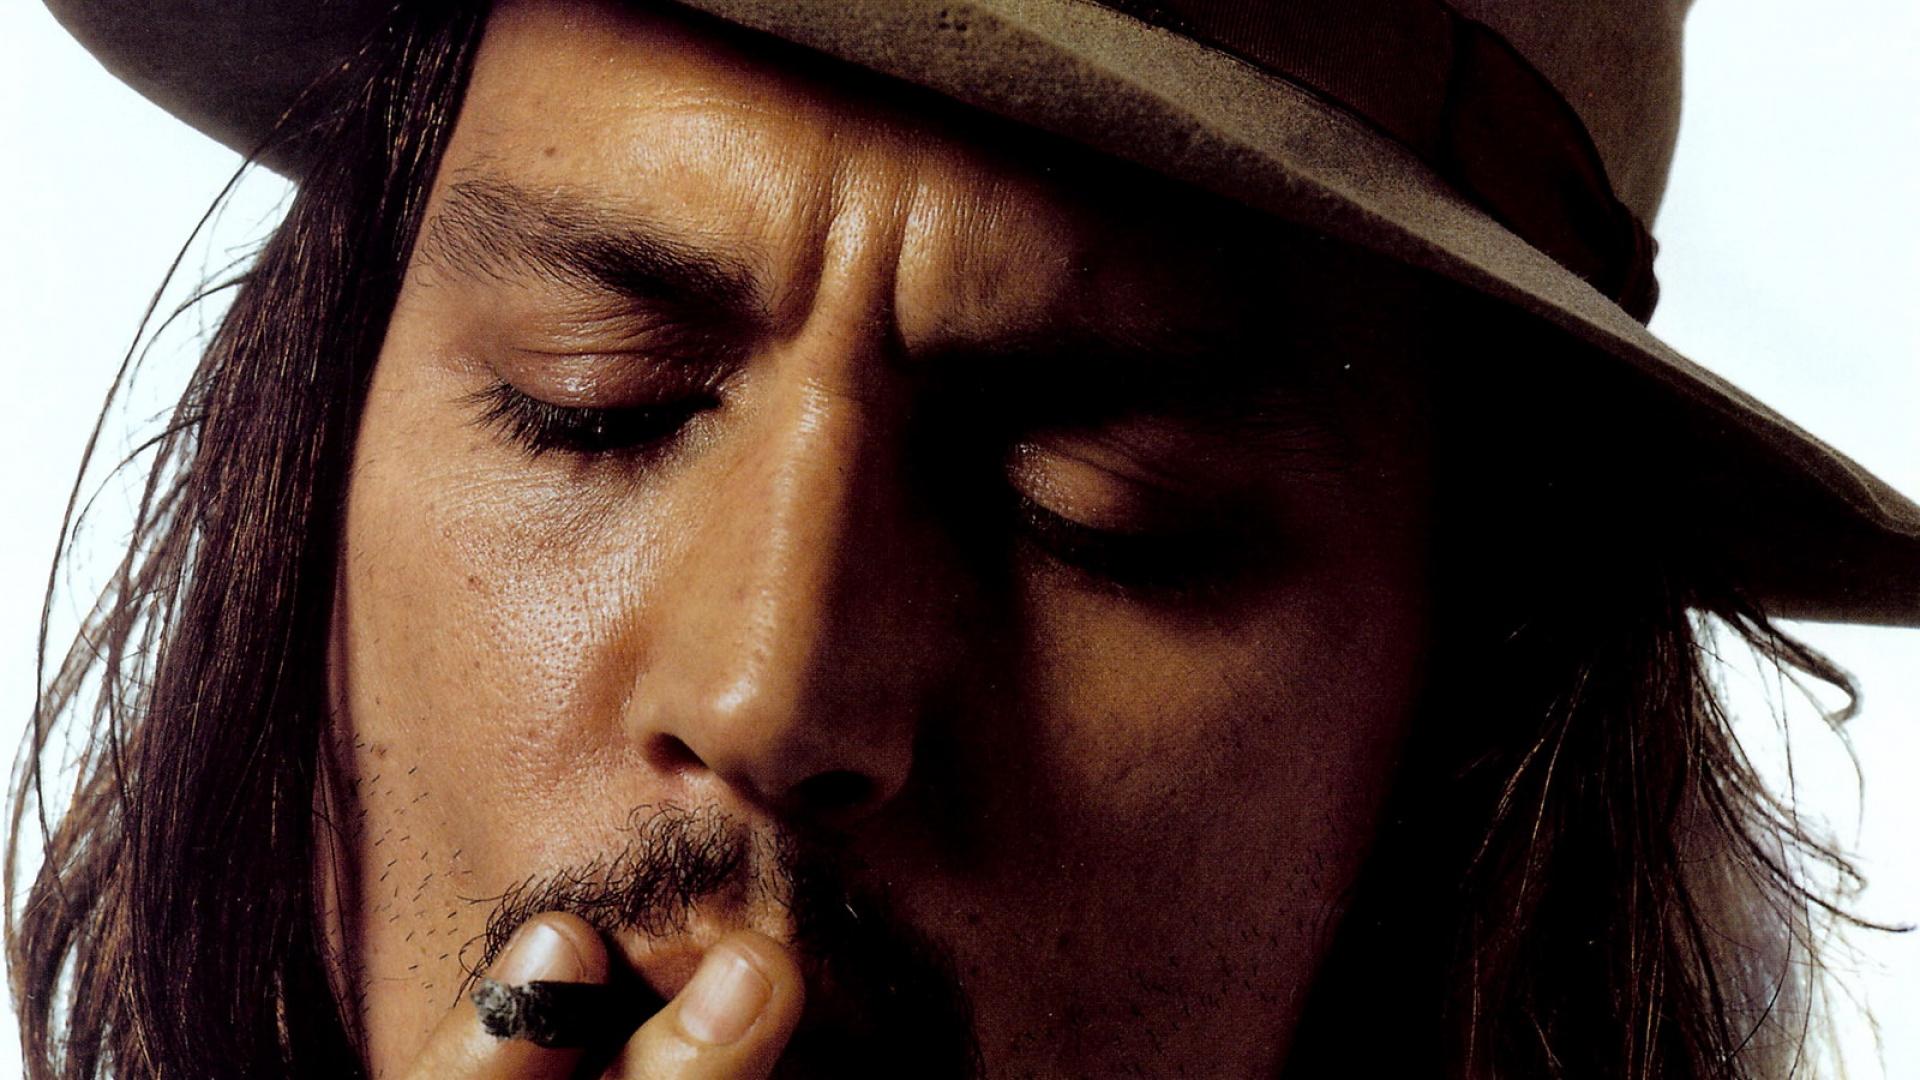 Johnny Depp Cigarette Face